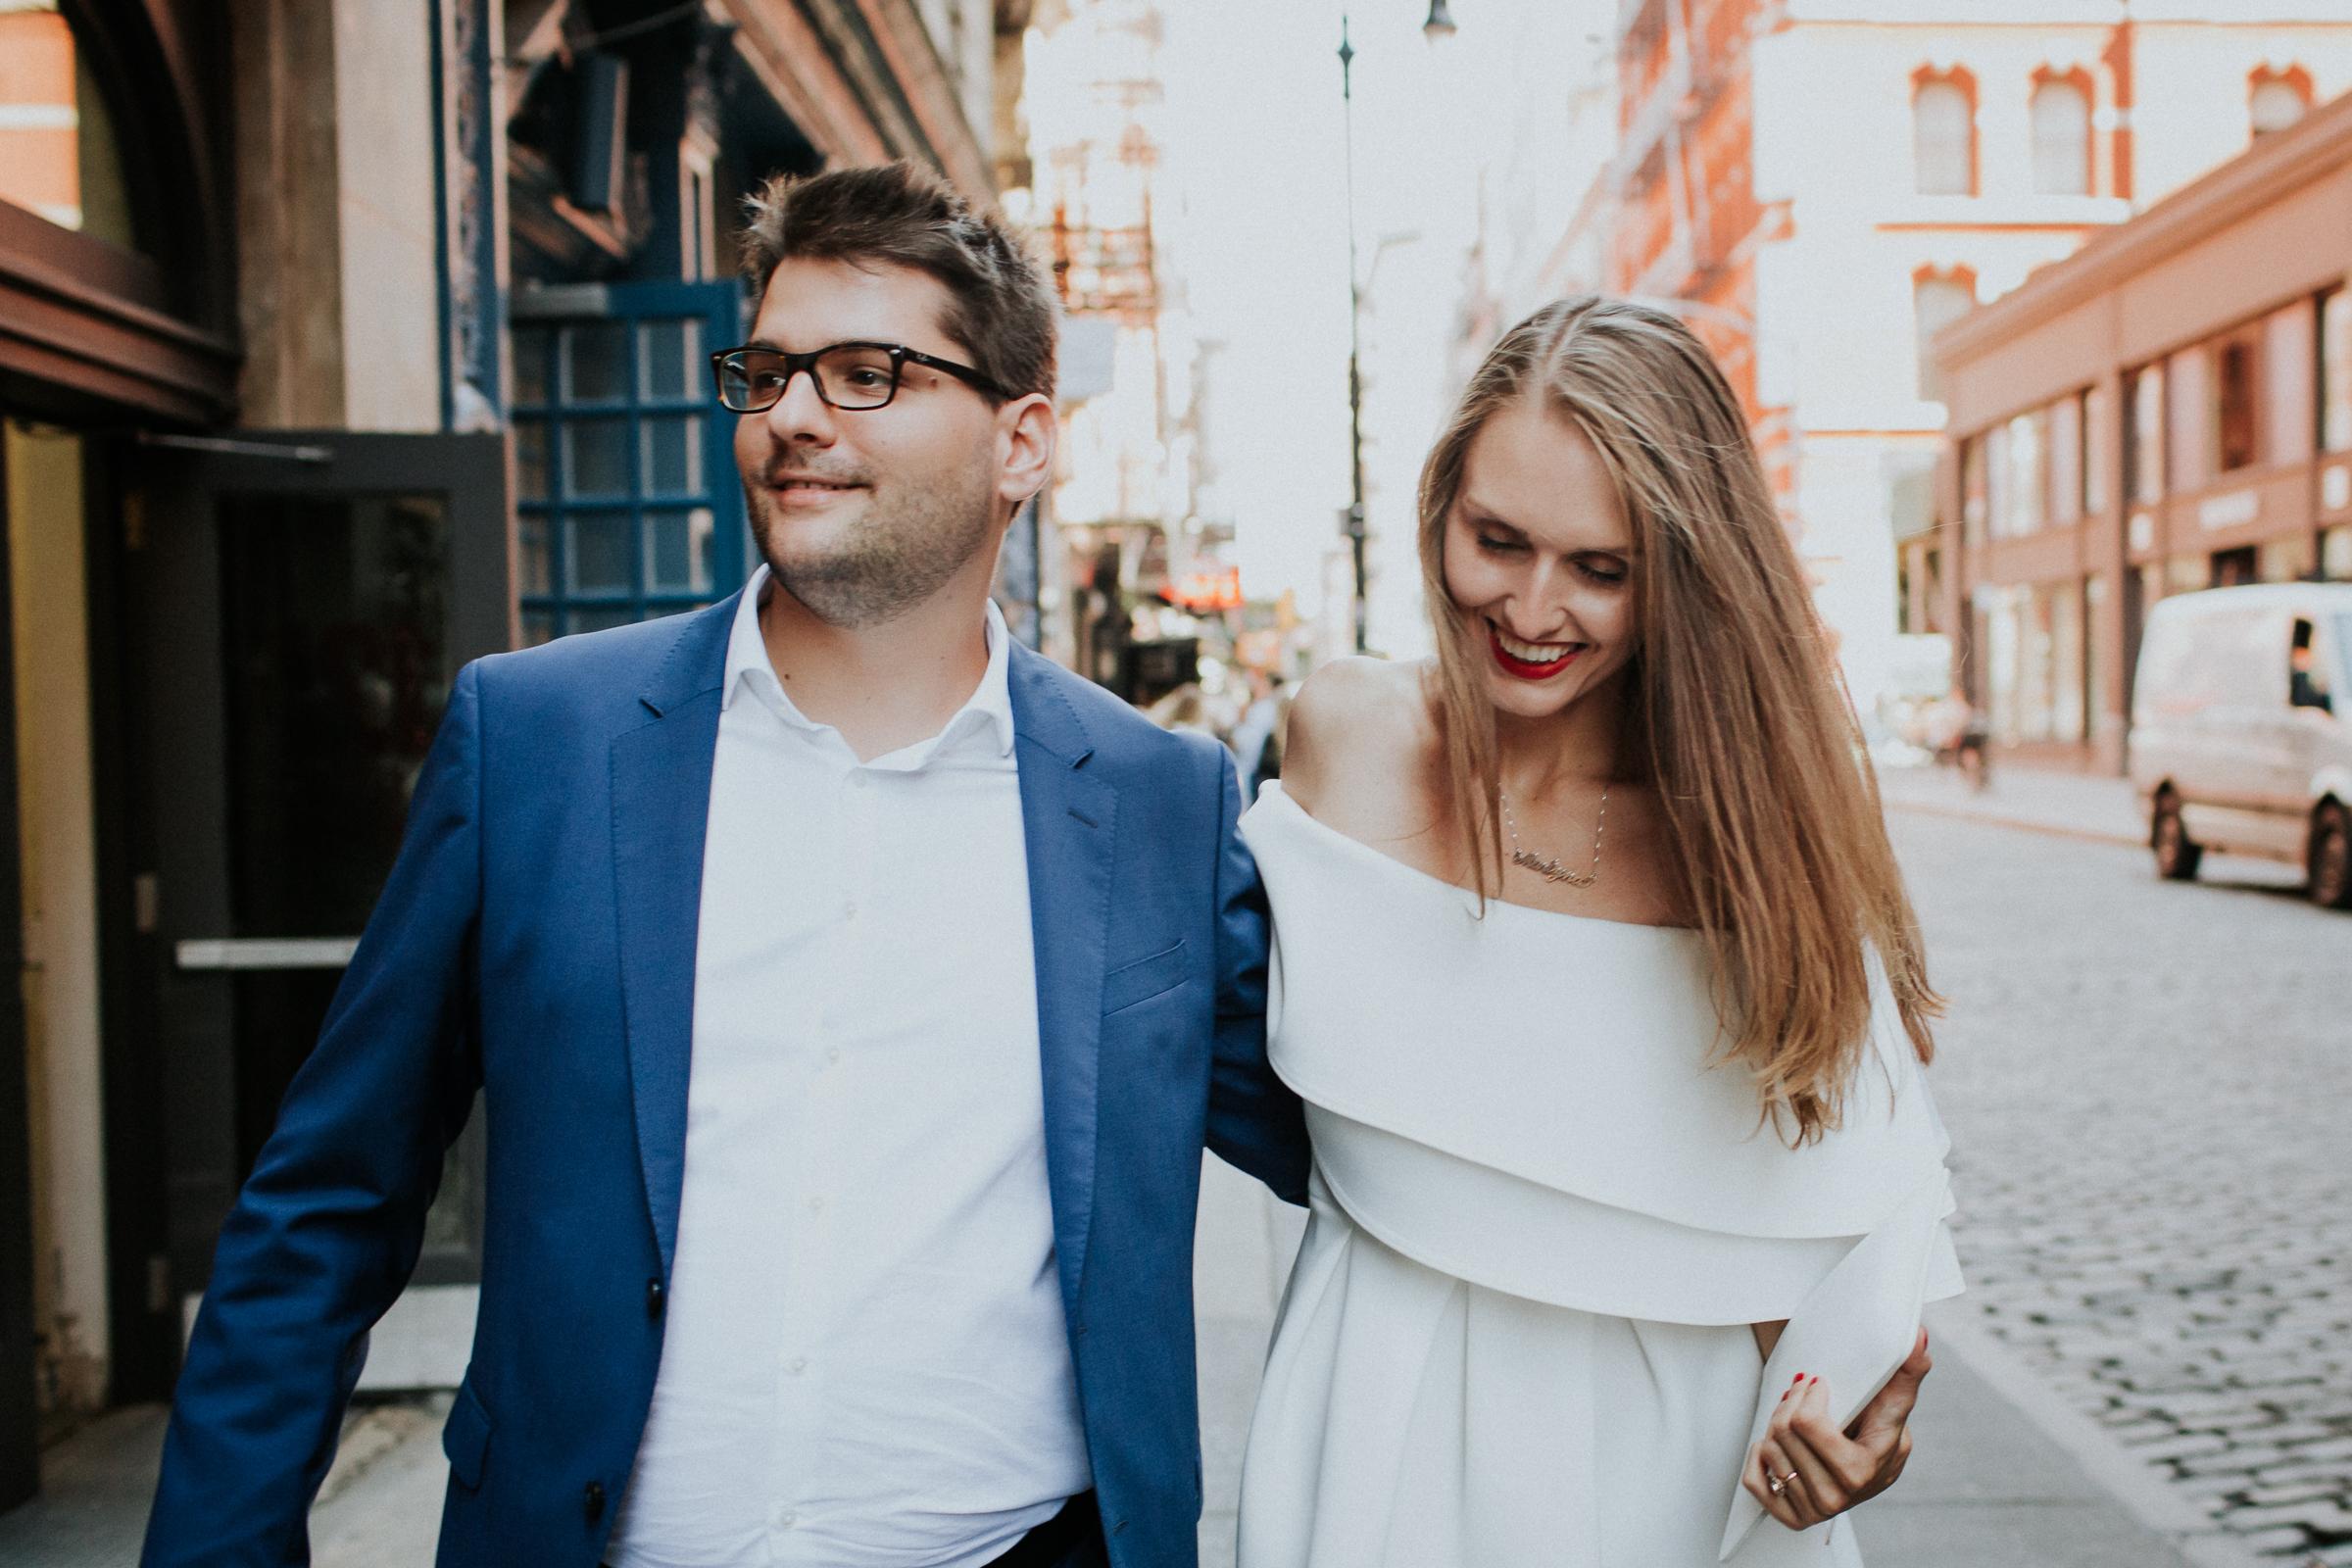 New-York-City-Hall-Elopement-NYC-Documentary-Wedding-Photographer-36.jpg